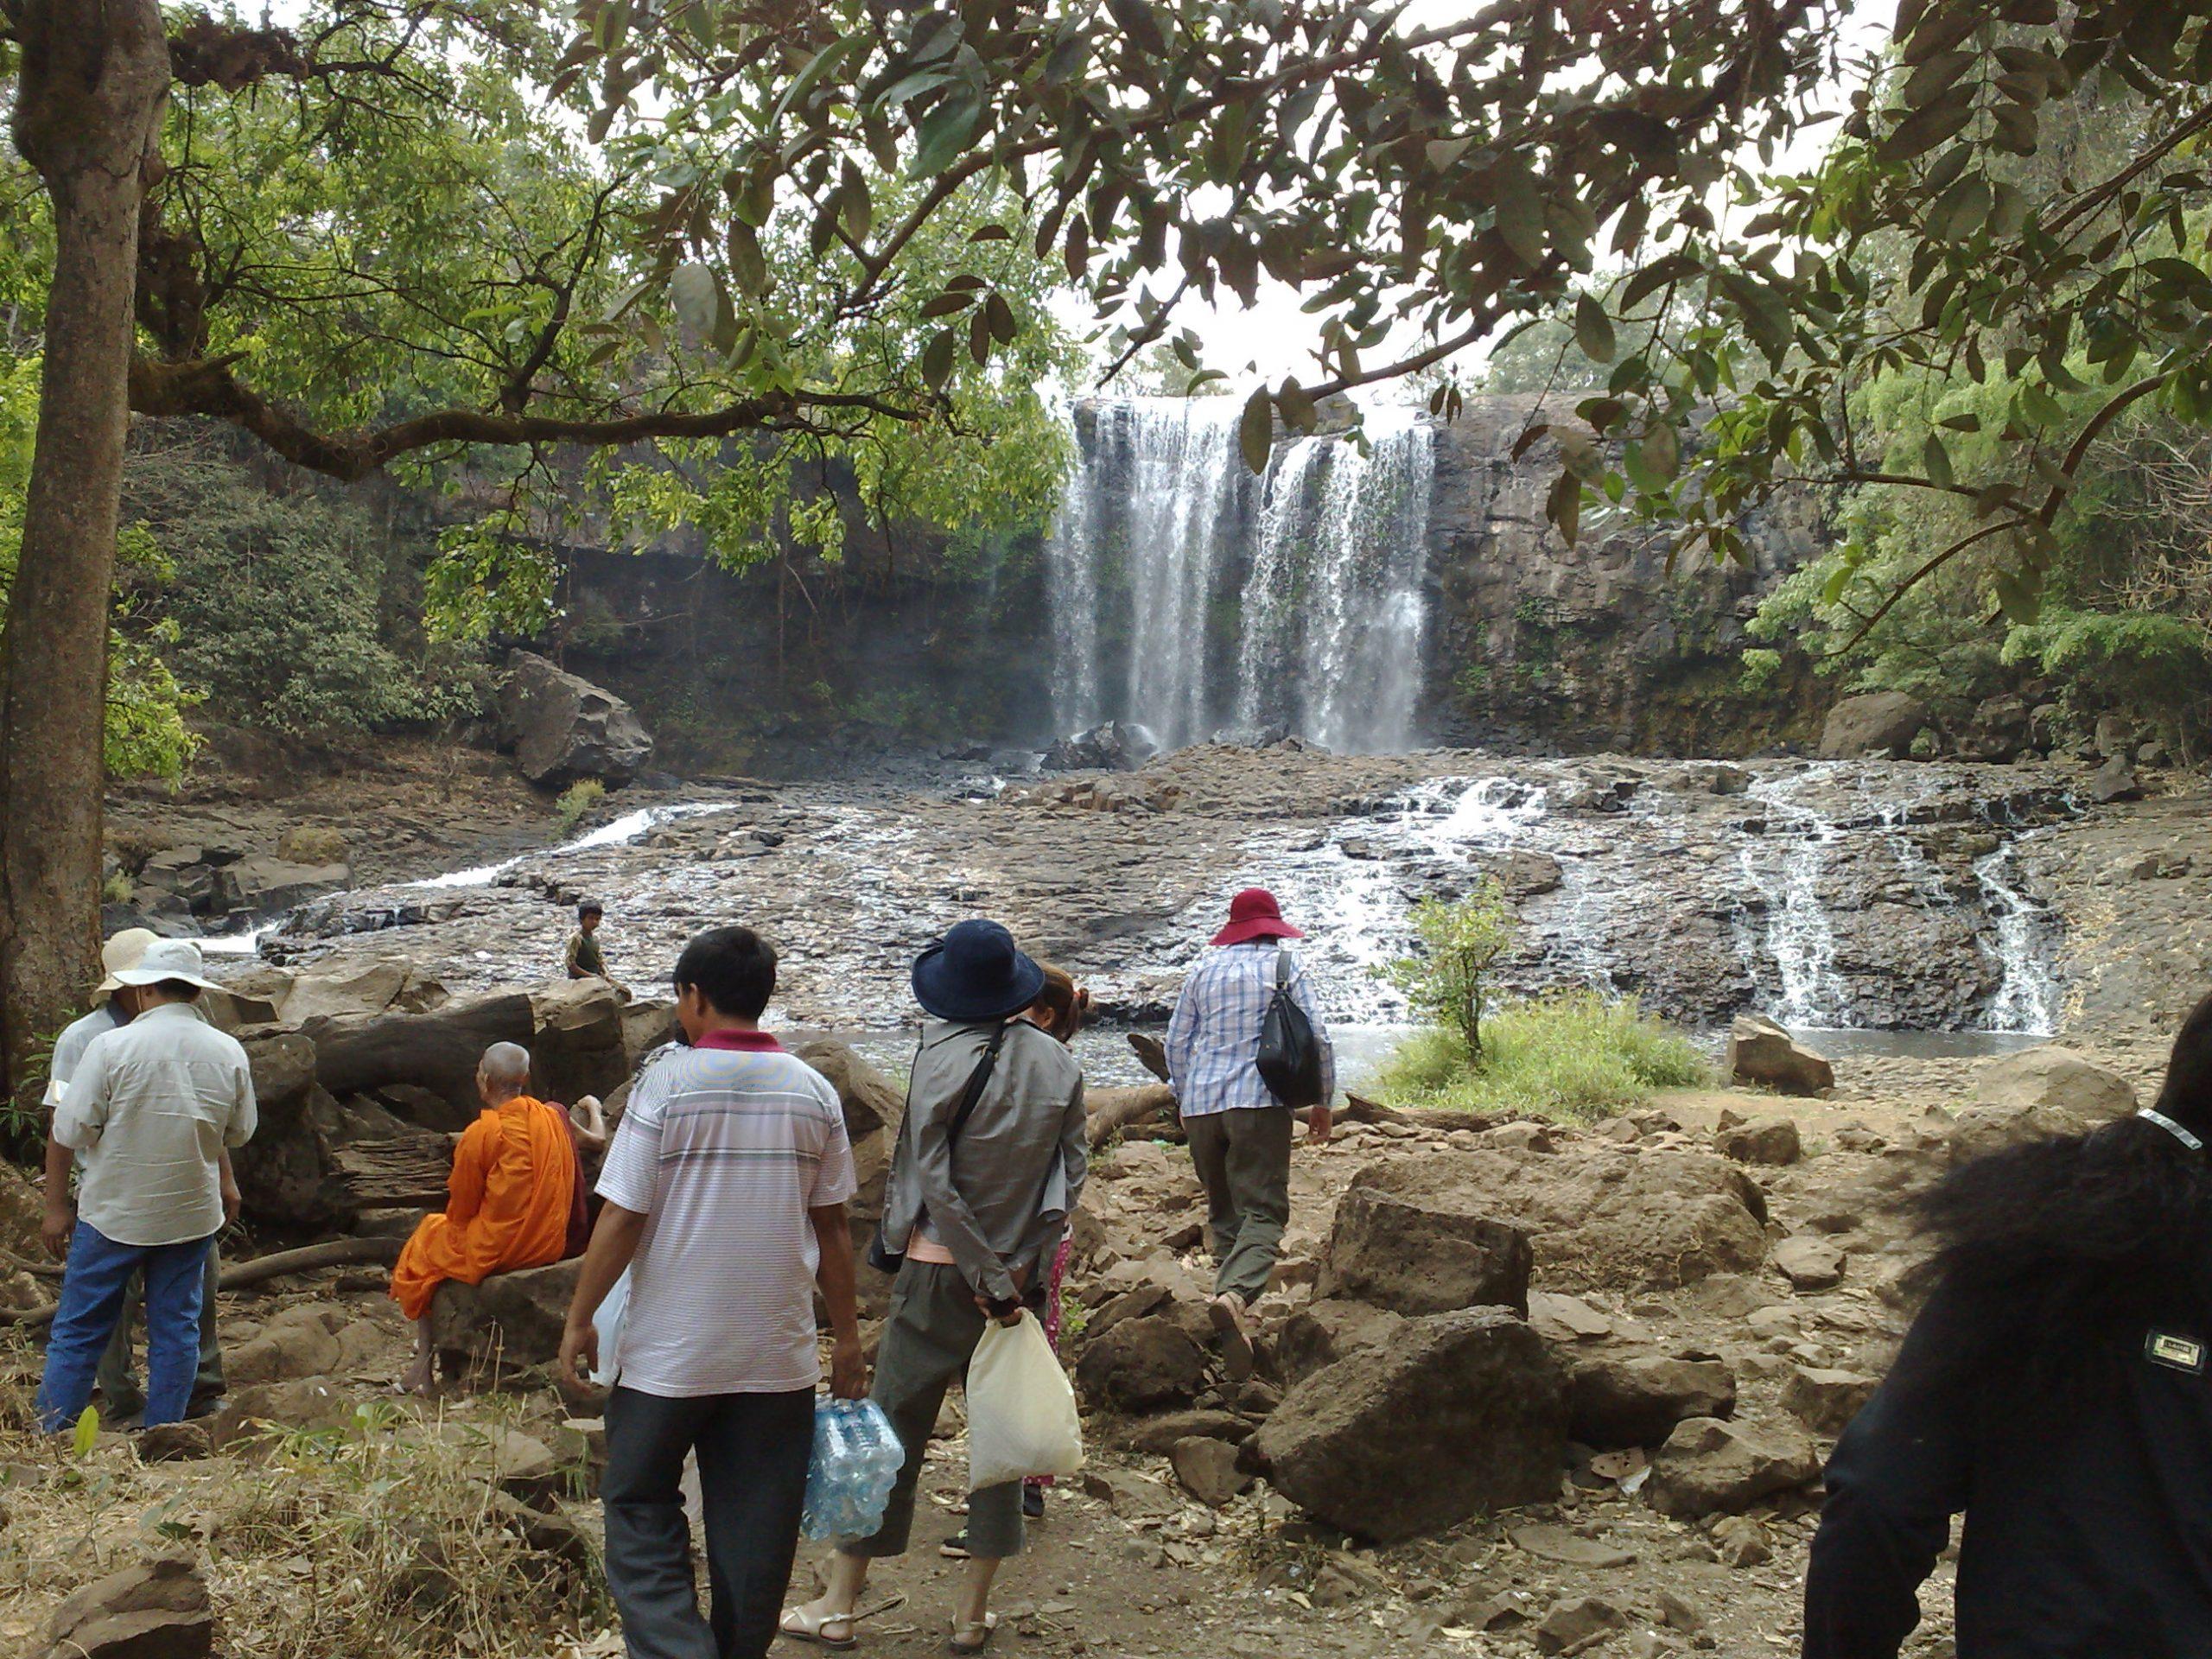 Visit the Serene Province of Mondulkiri, Bou Sra falls, Cambodia